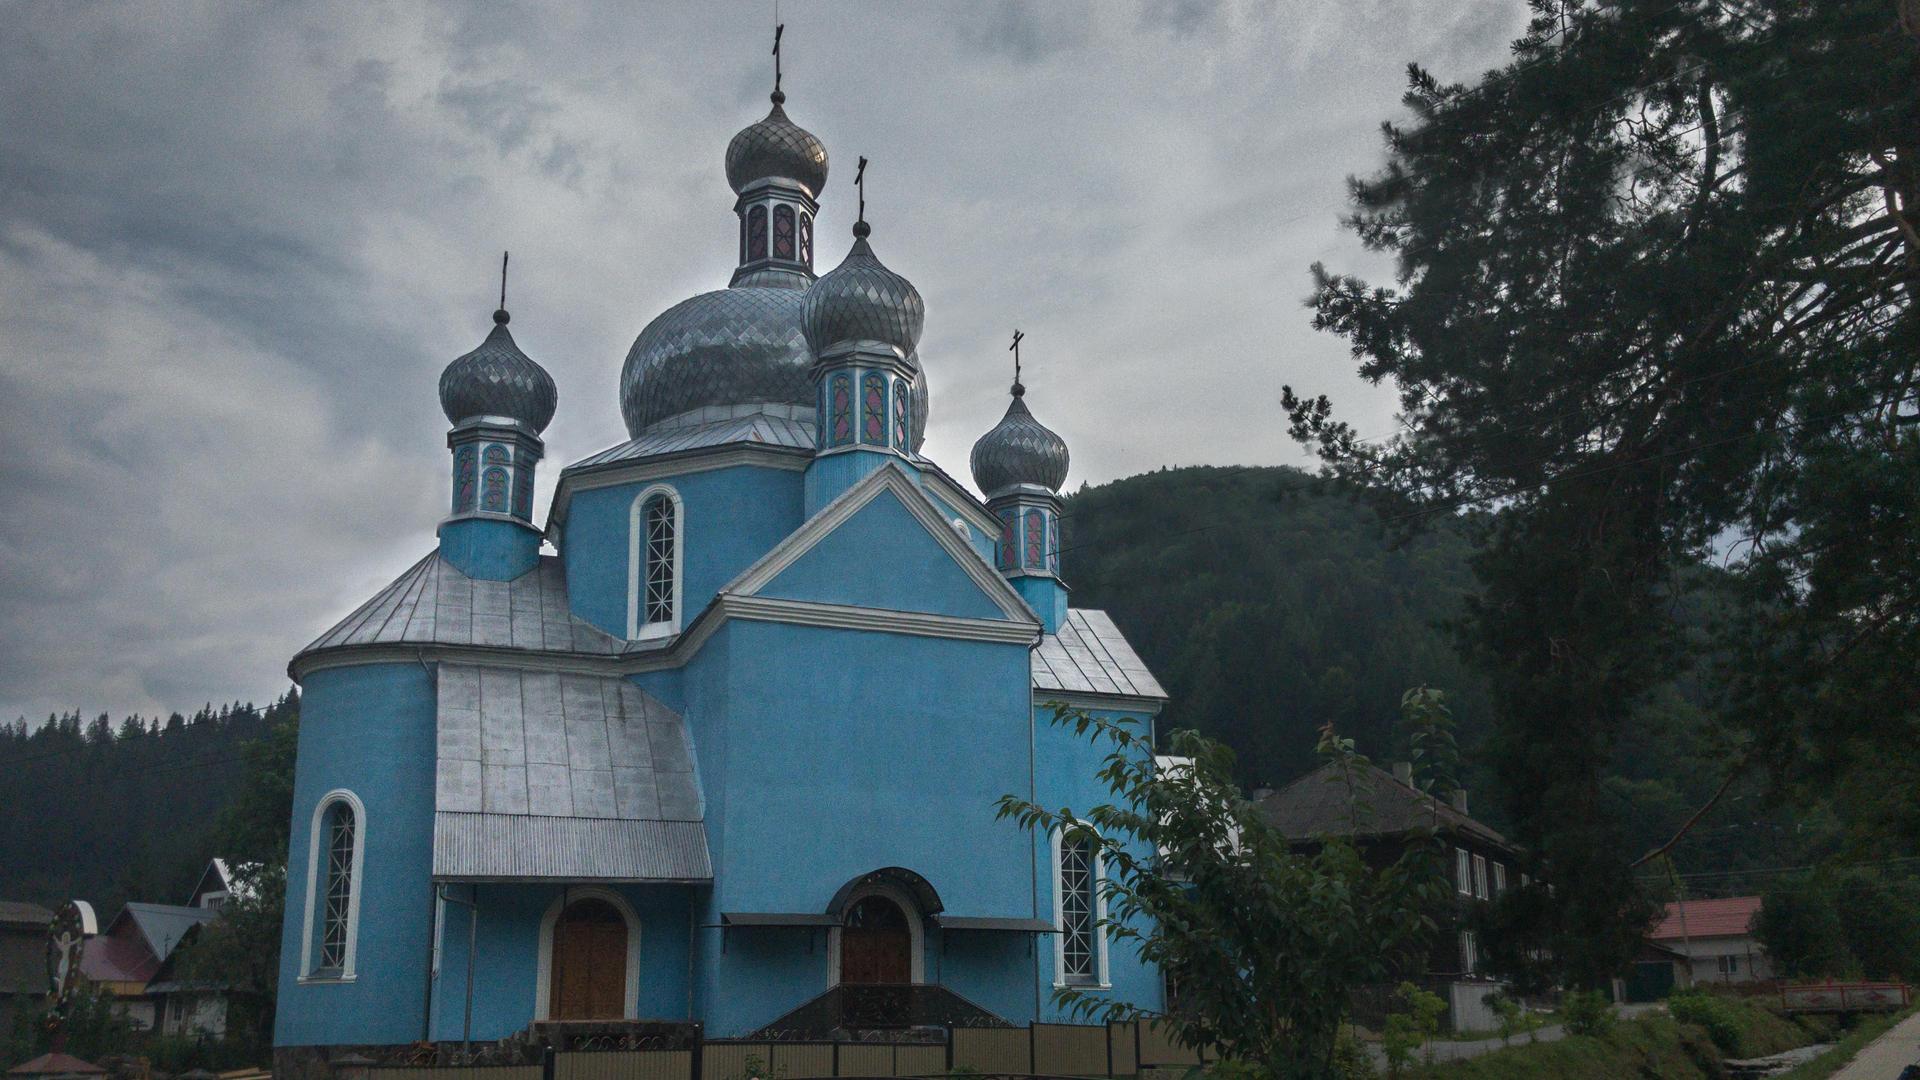 carpathians church, orthodox church, ust-corna church, ust-corna